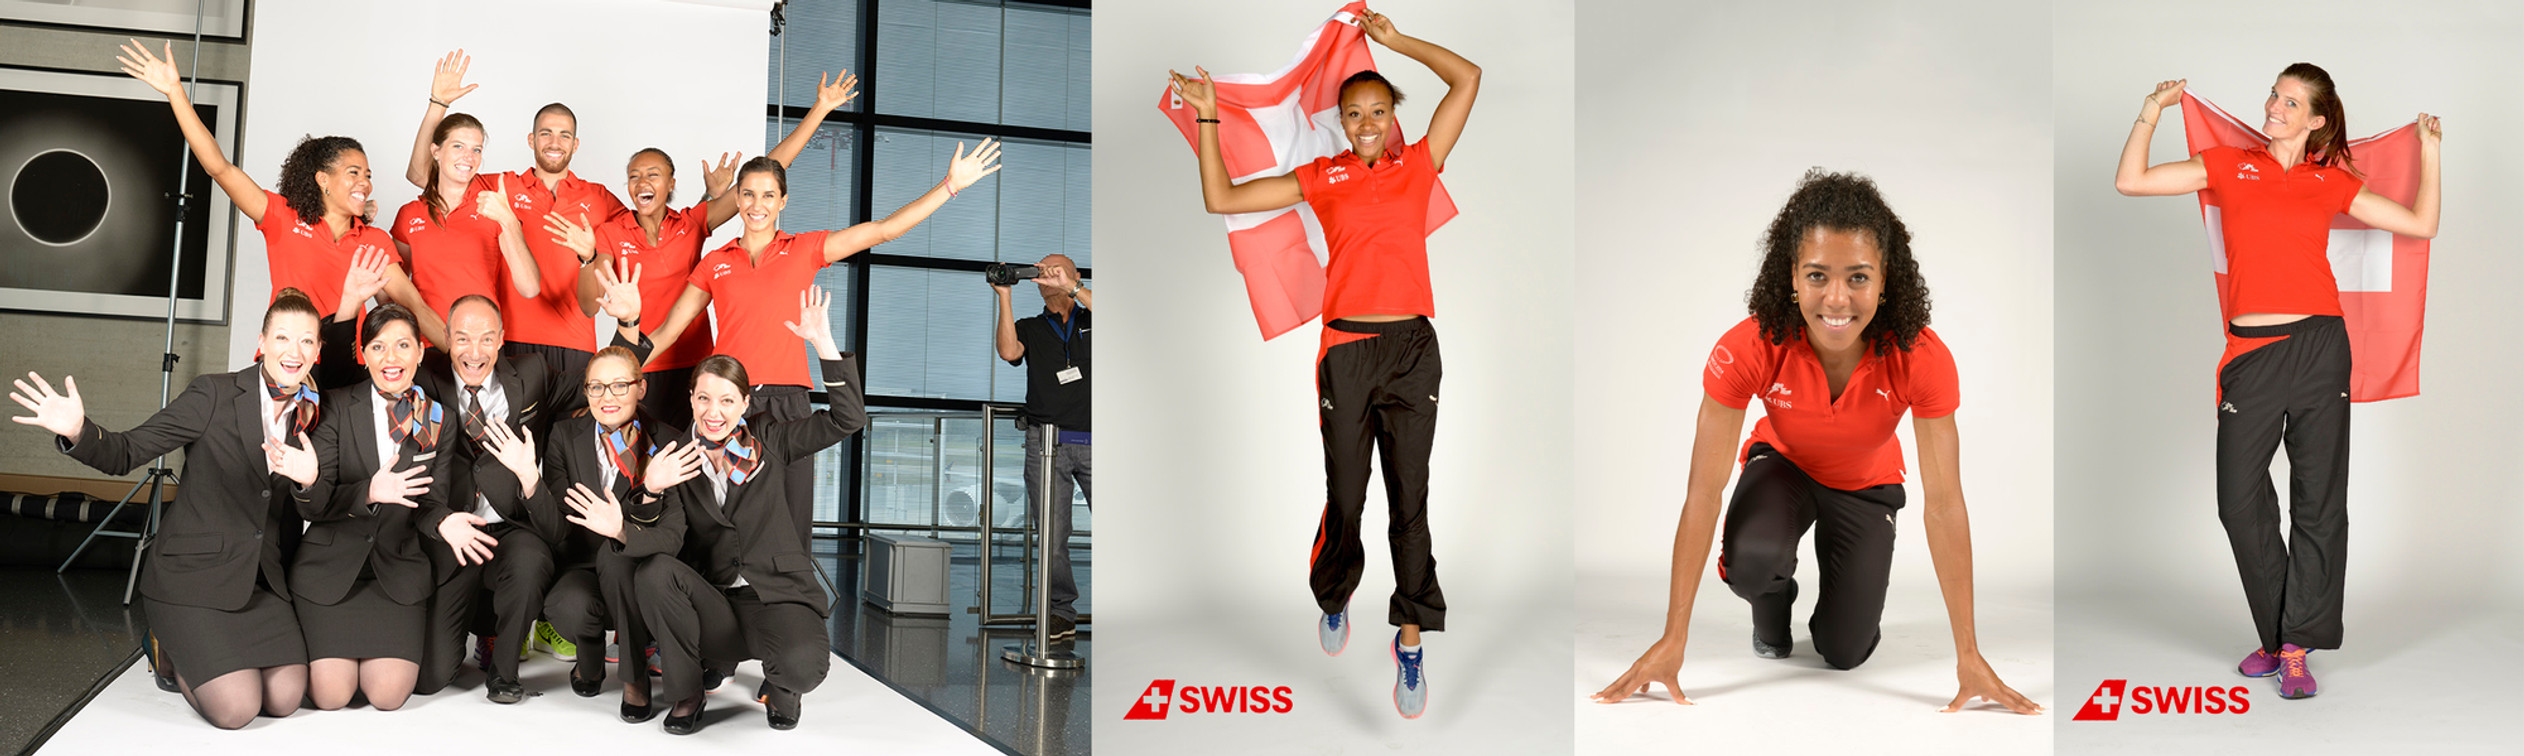 WORLD CHAMPIONSHIP TEAM SWITZERLAND